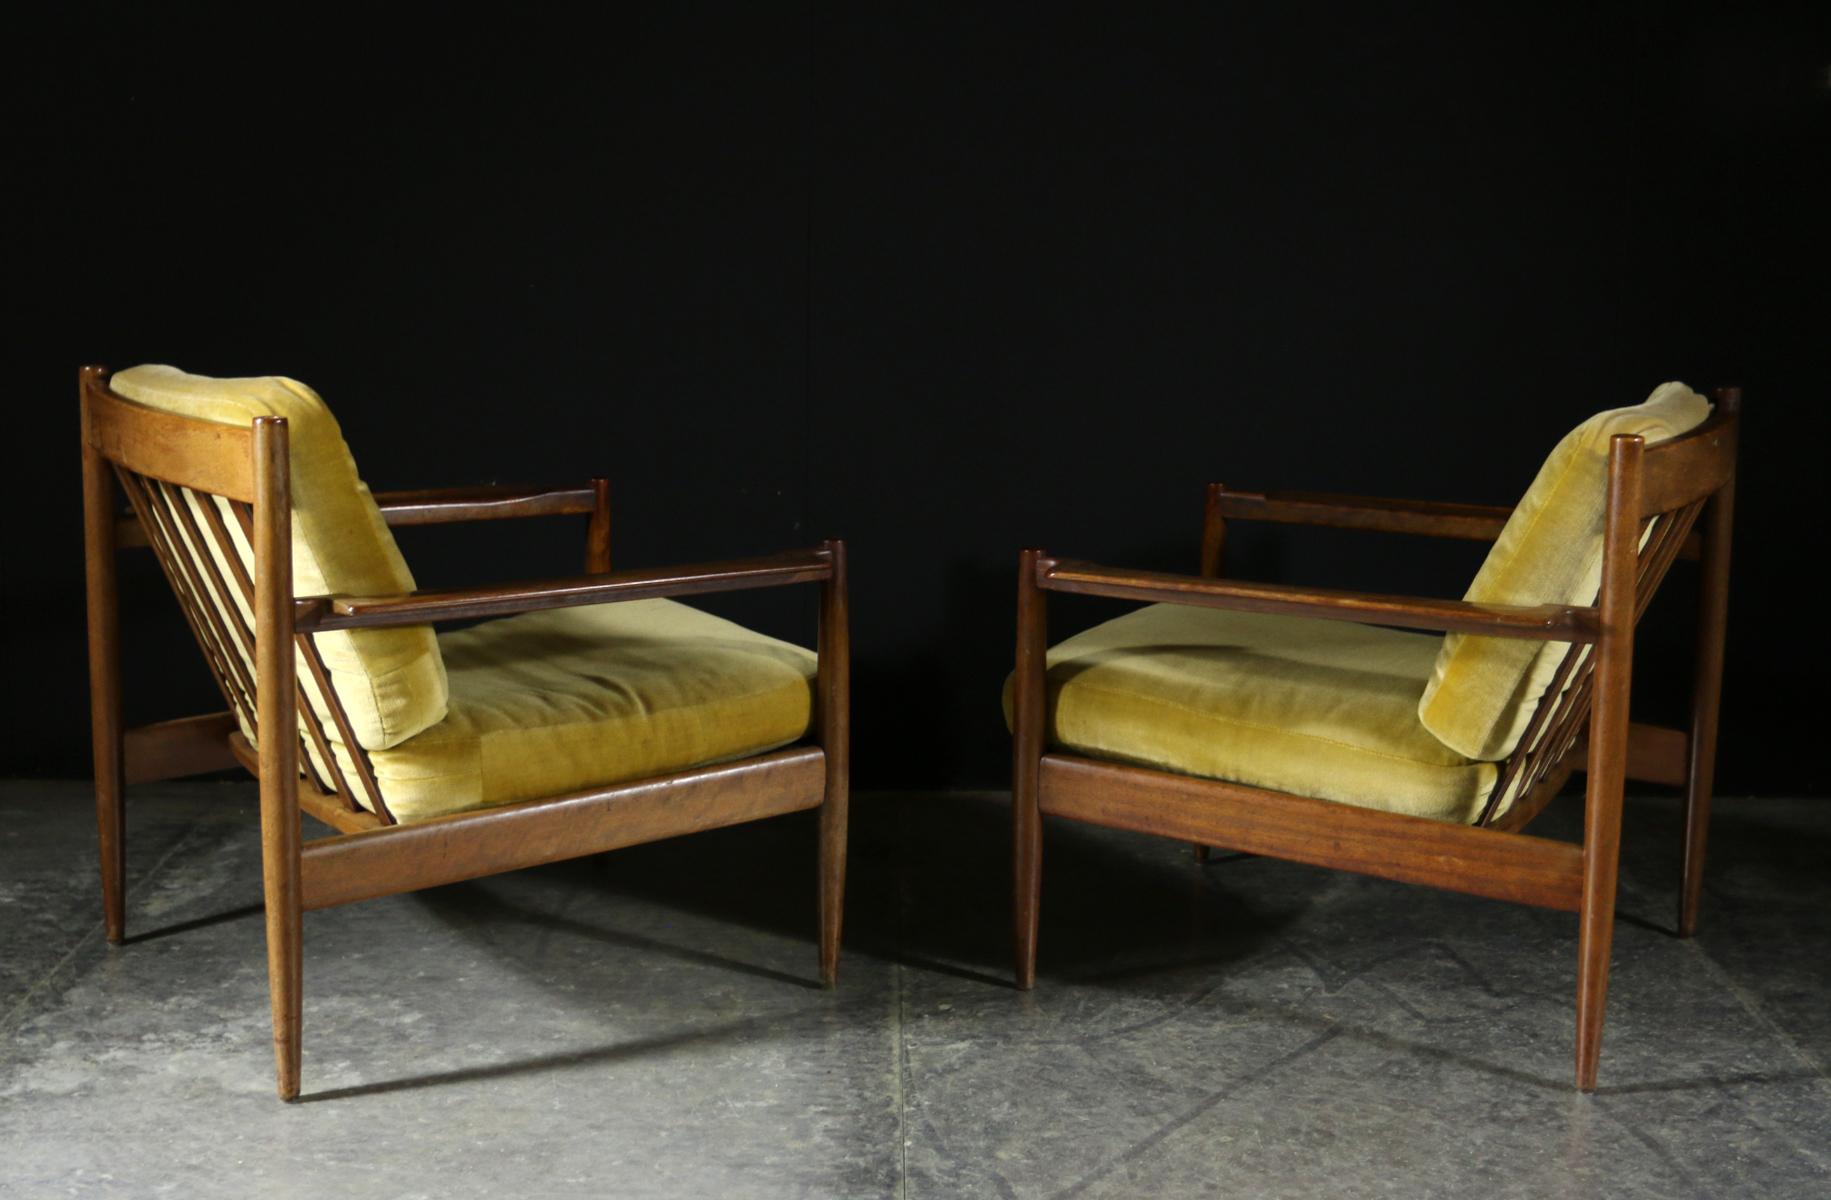 Top vintage design teakhout fauteuils jaren 50 for Mooie design fauteuils